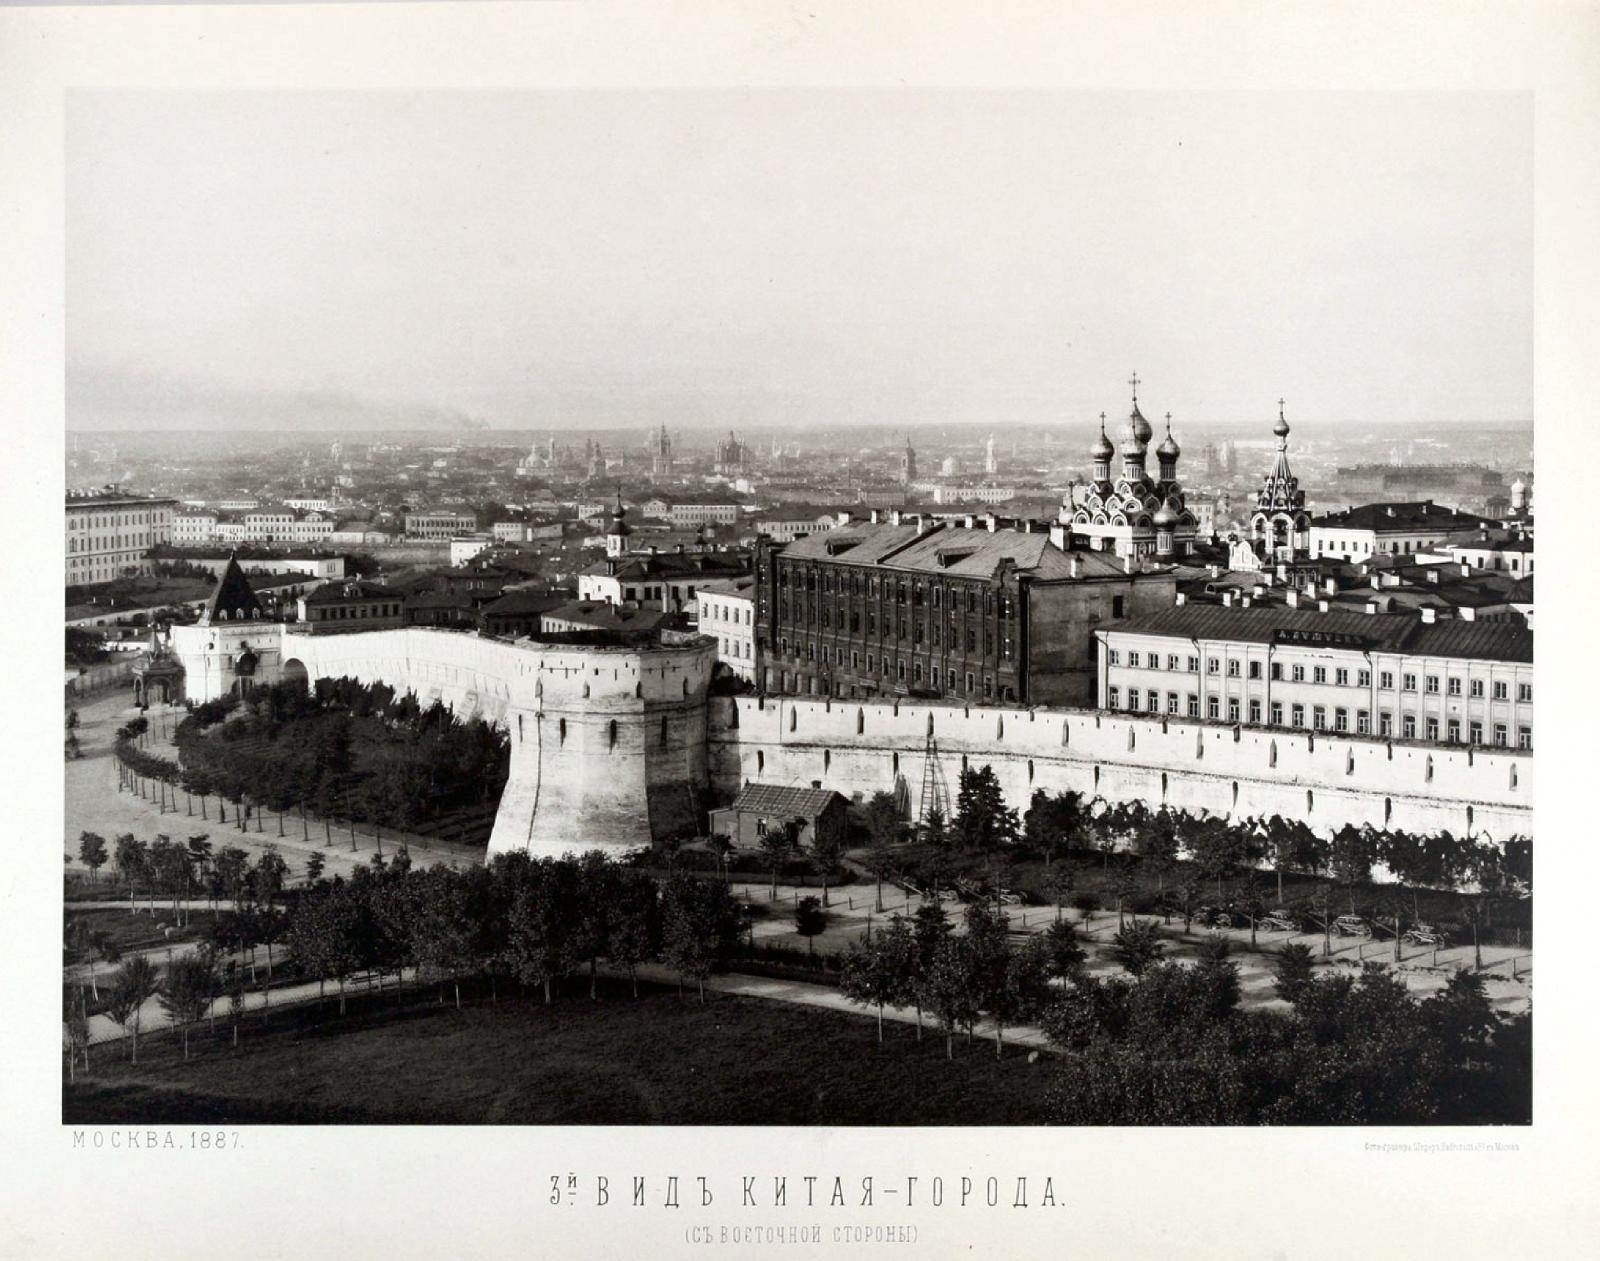 Файл:N.A.Naidenov (1888). Views of Moscow. 04. Kitaigorod wall